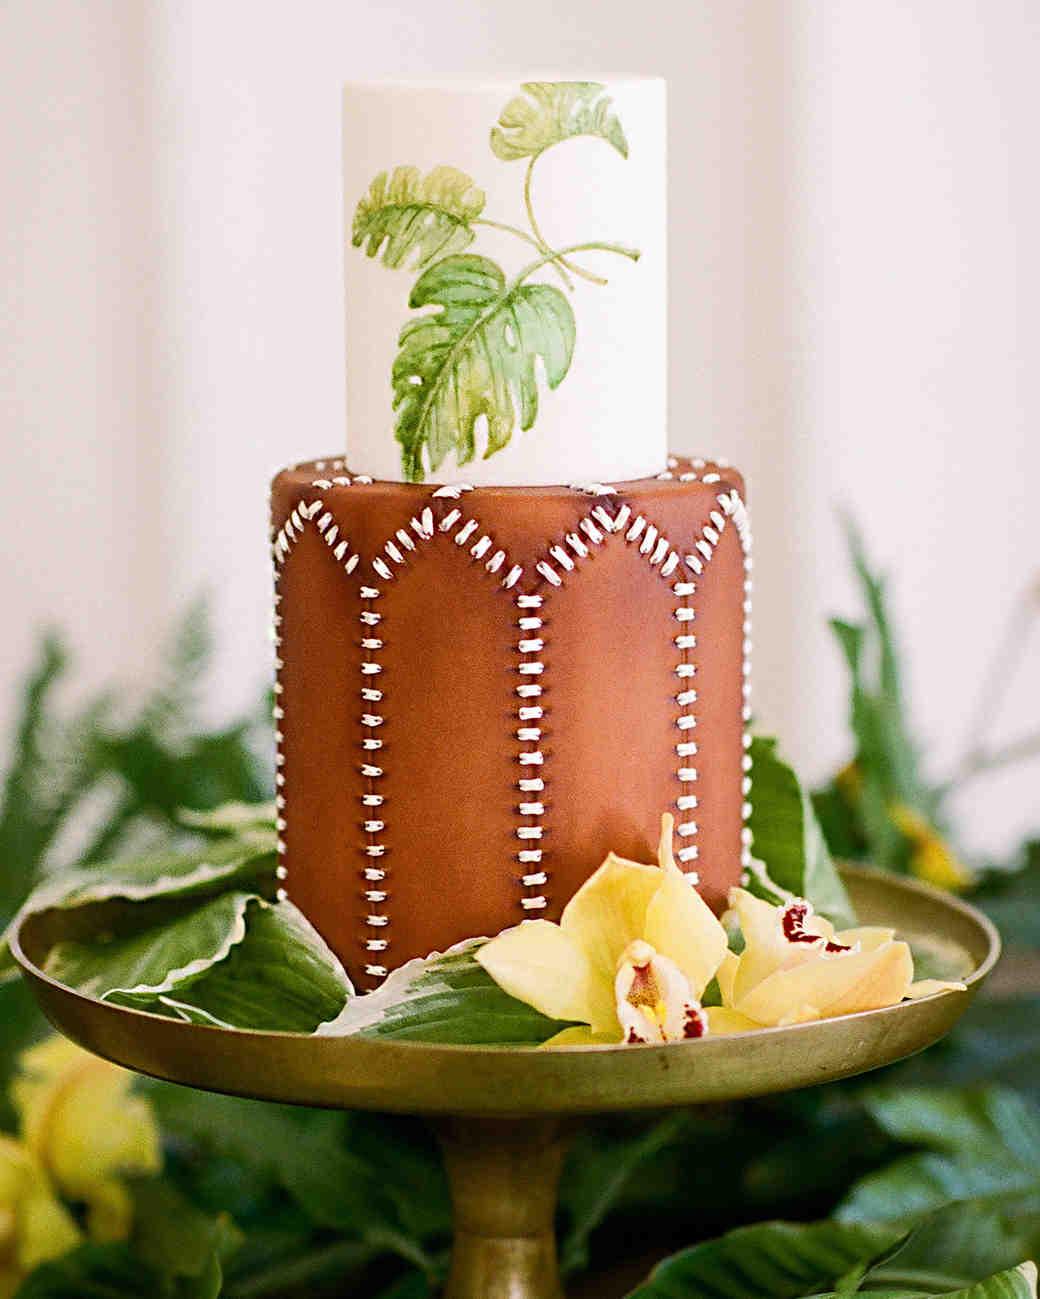 chocolate cake with botanical details